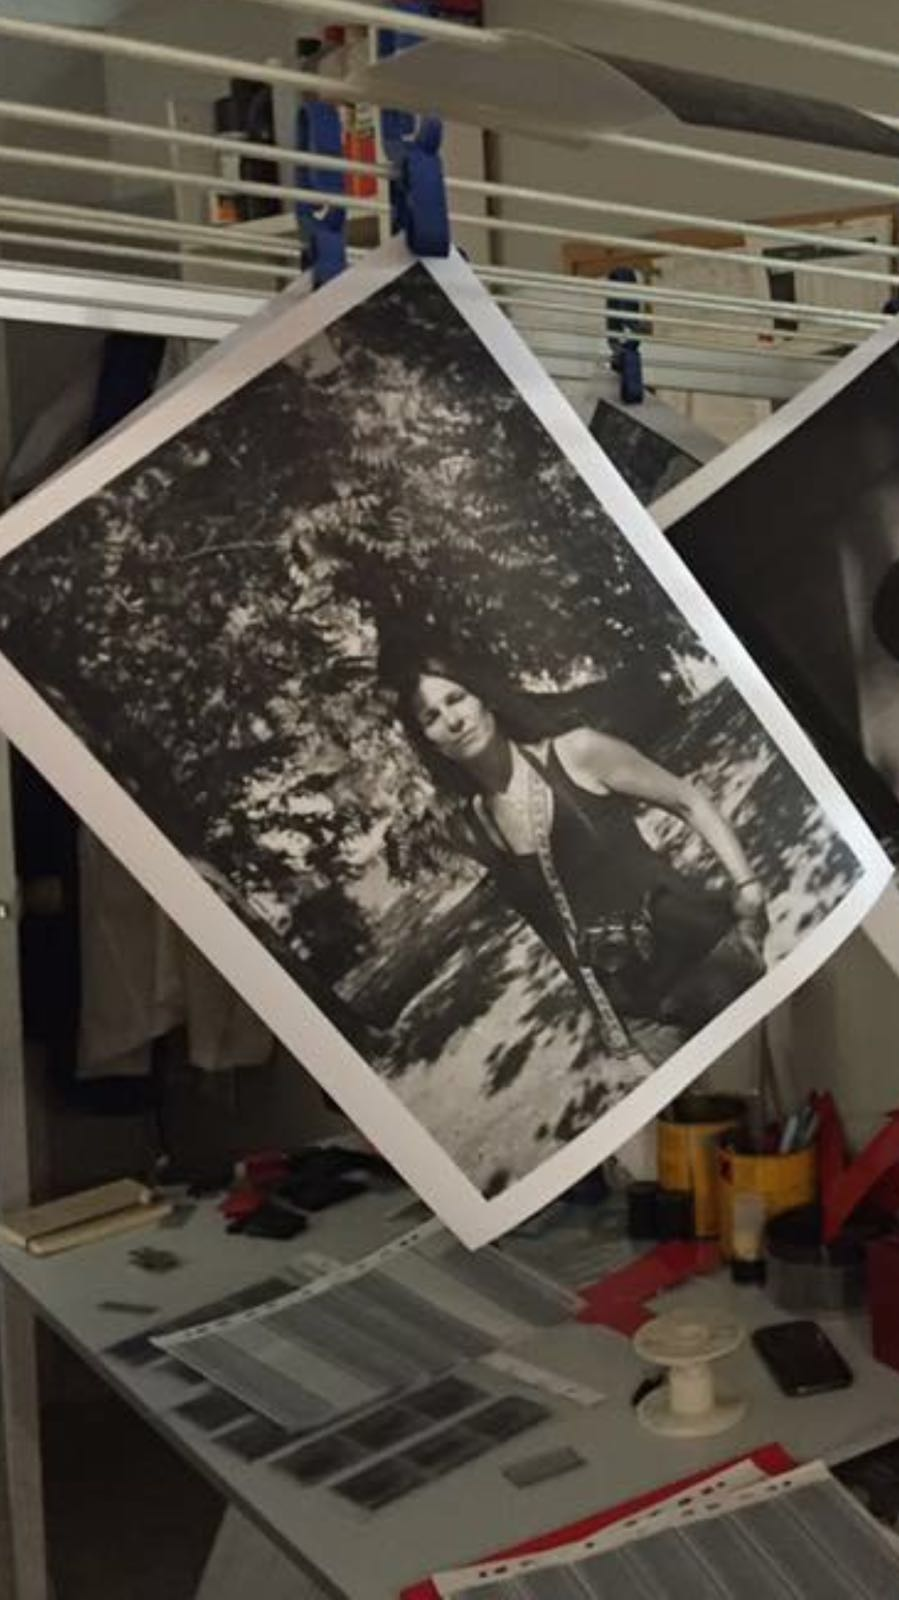 Taller retrato+positivado Talleres de fotografia analogica Rubén Morales Estela de Castro Laboratorio fotografico